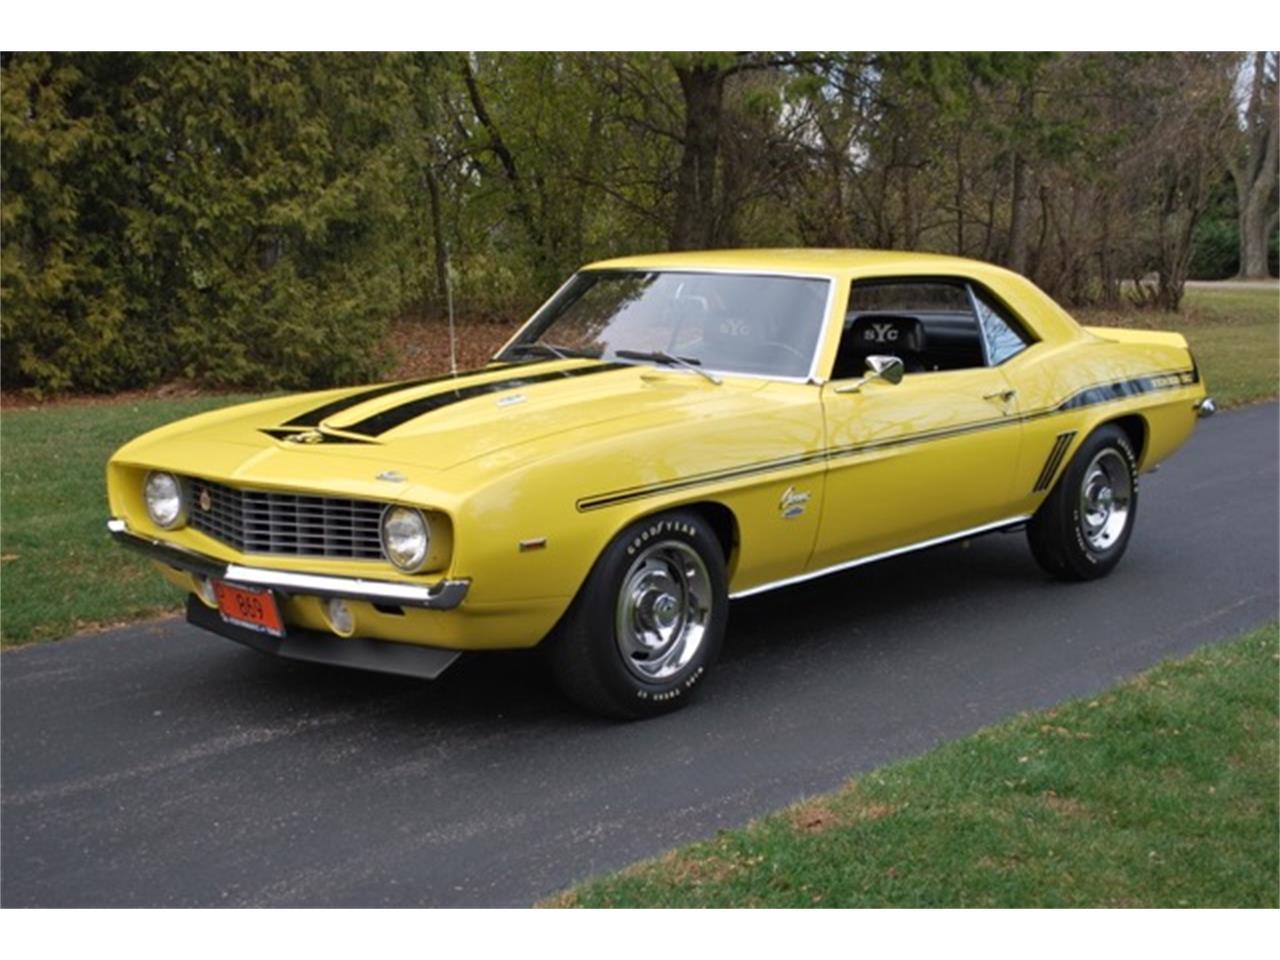 Yenko Camaro For Sale >> 1969 Chevrolet Camaro Copo Yenko For Sale Classiccars Com